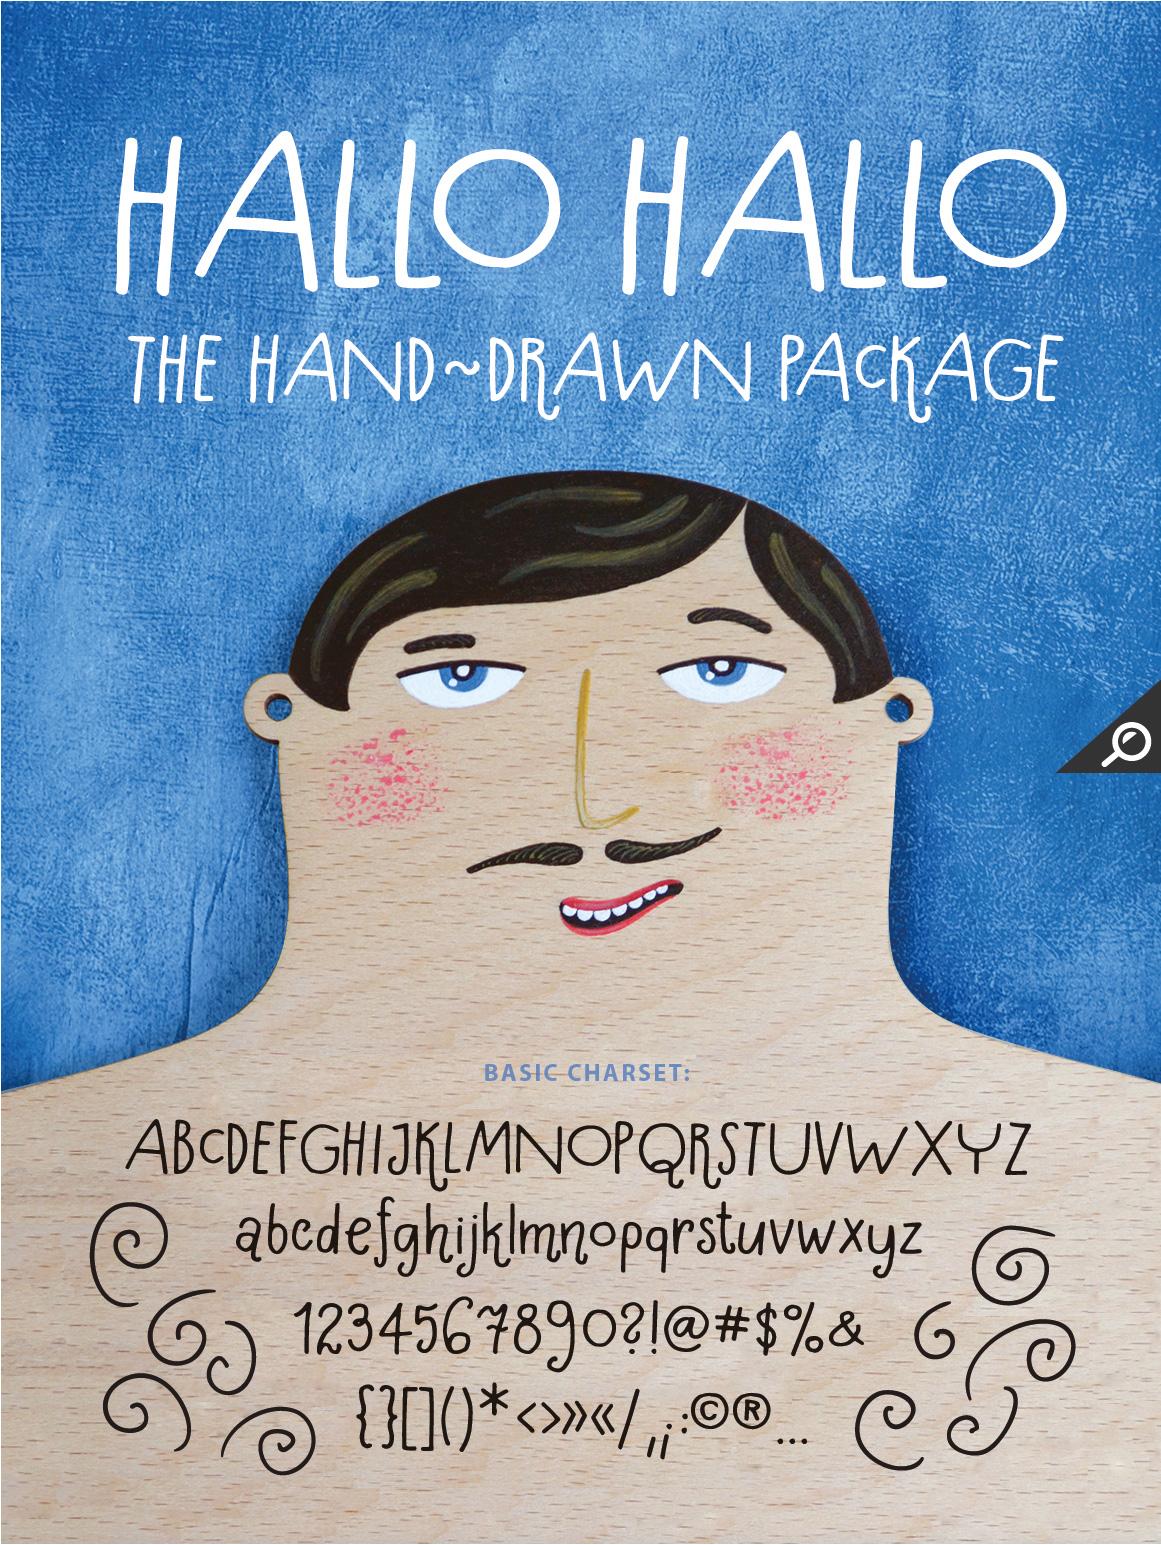 Hallo Hallo - HandDrawn Font Package example image 1